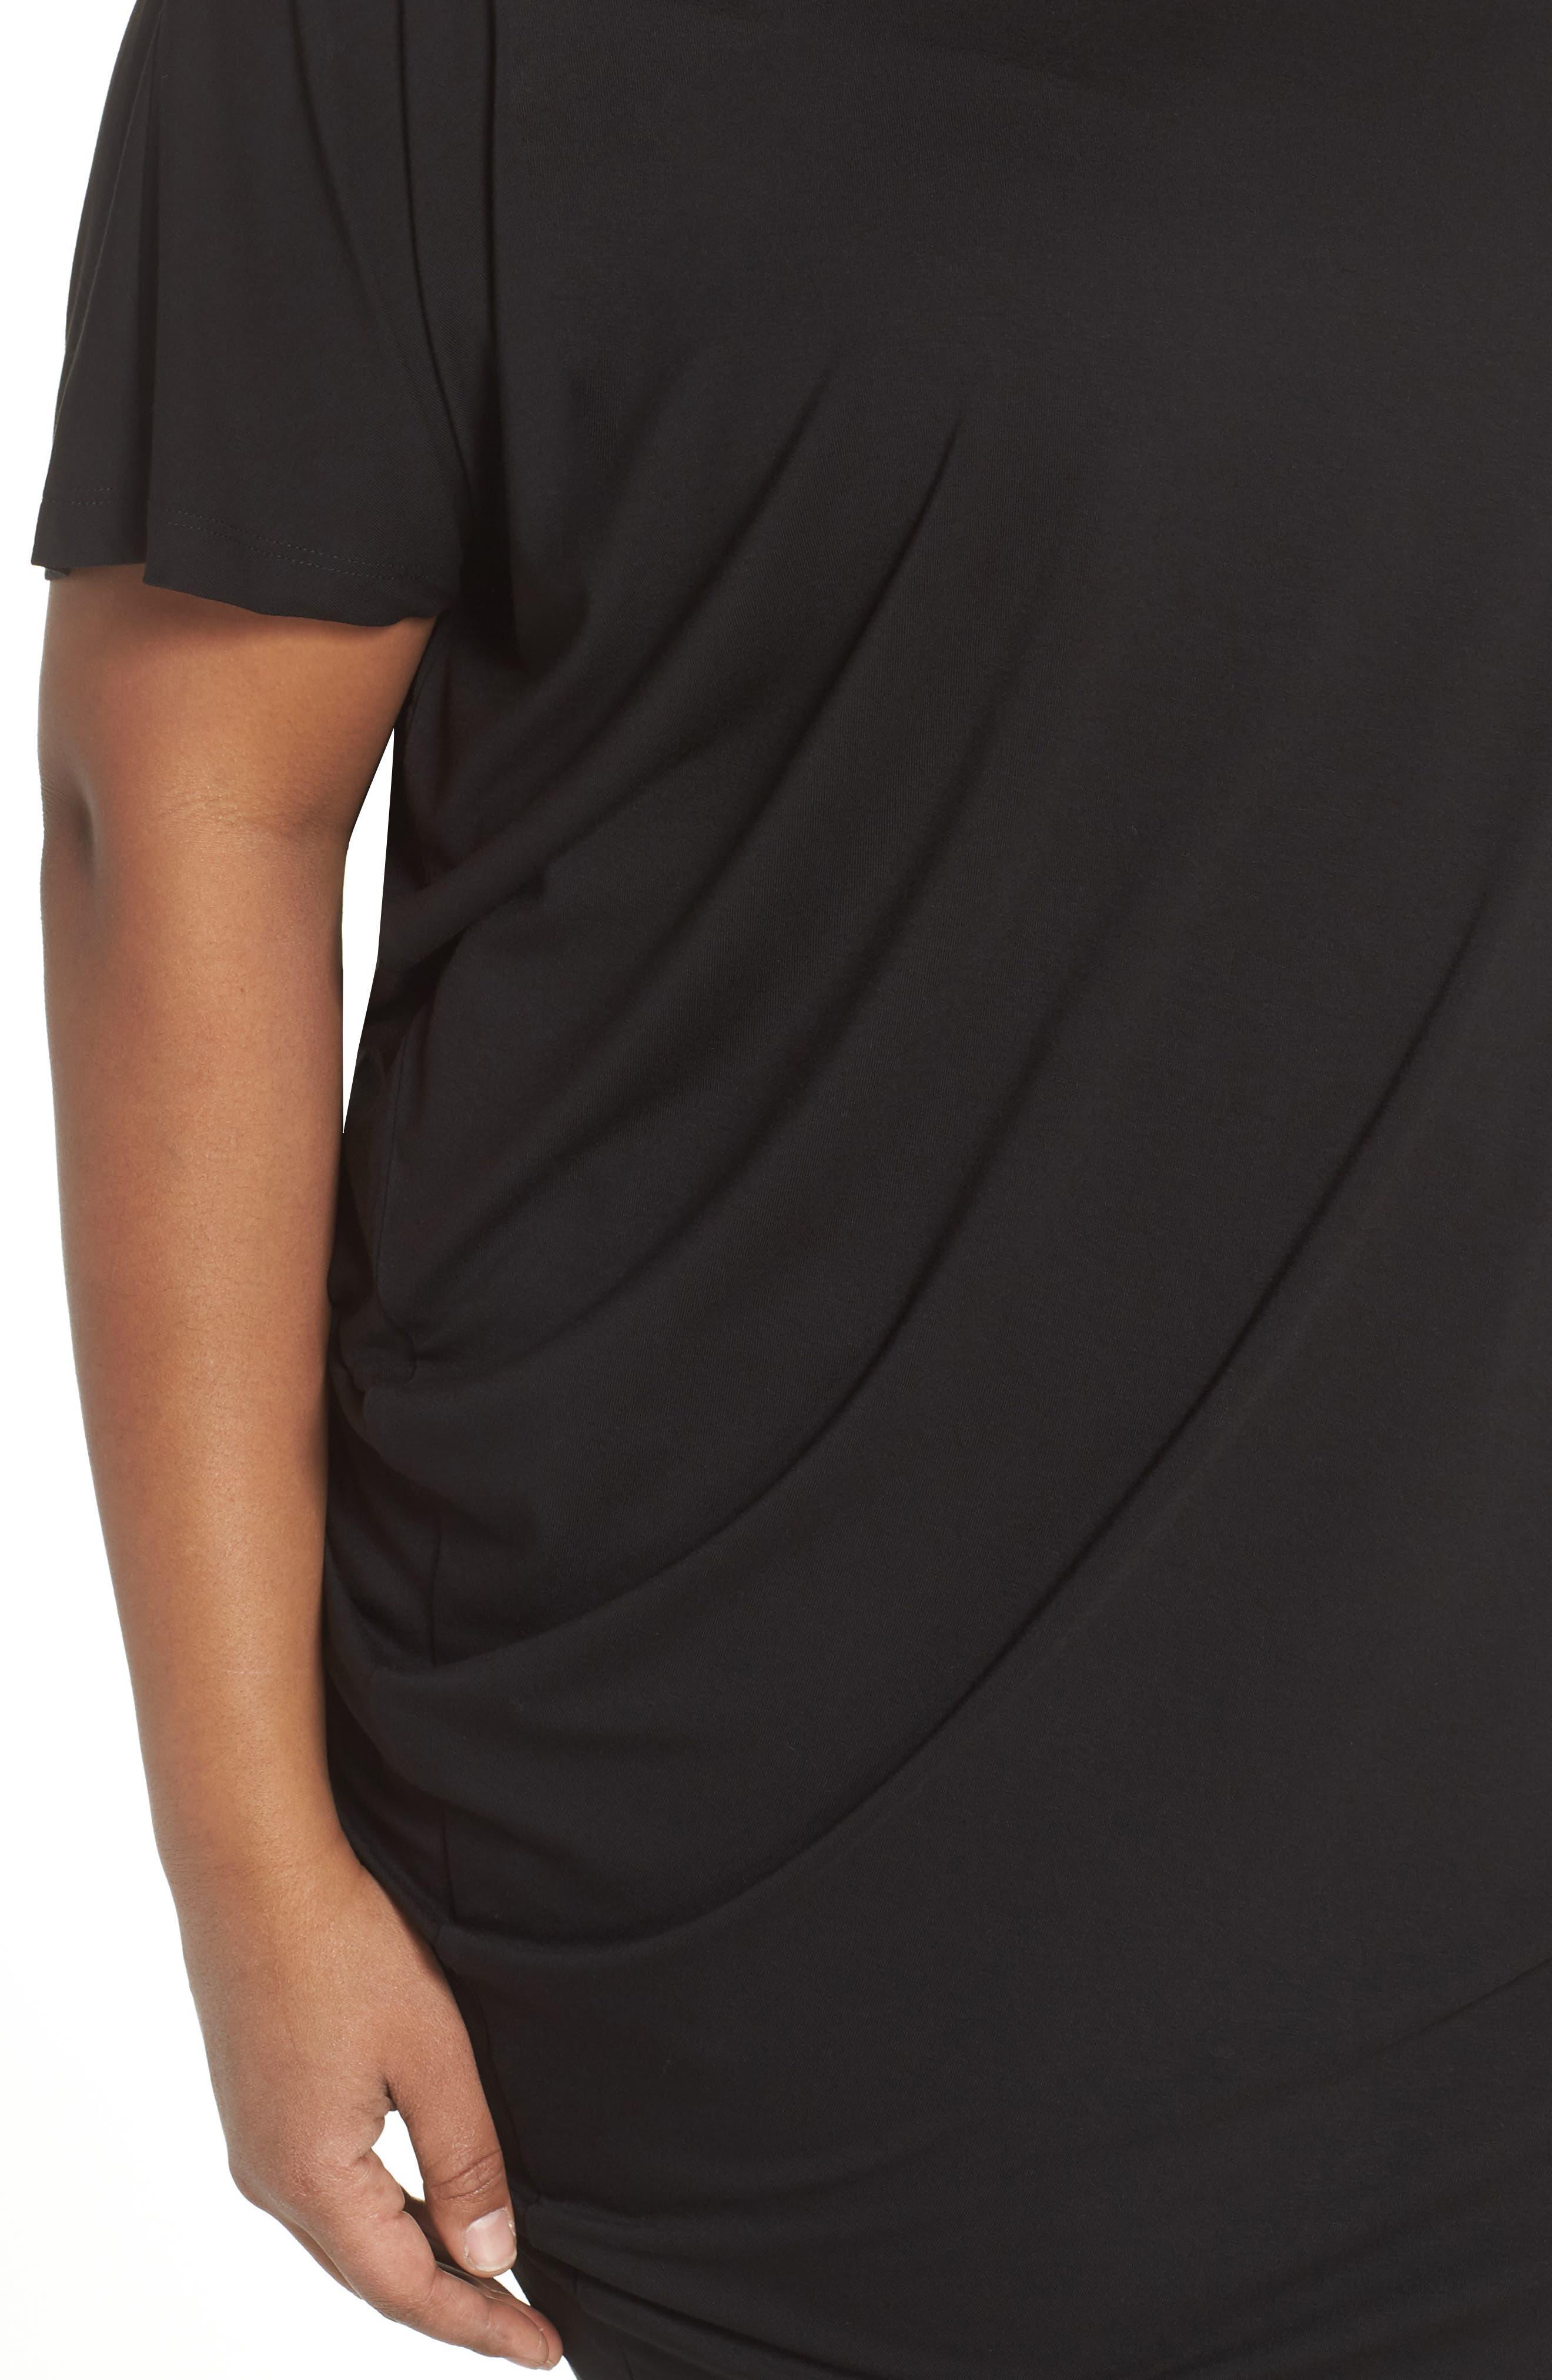 Asymmetrical Tunic Top,                             Alternate thumbnail 4, color,                             Black